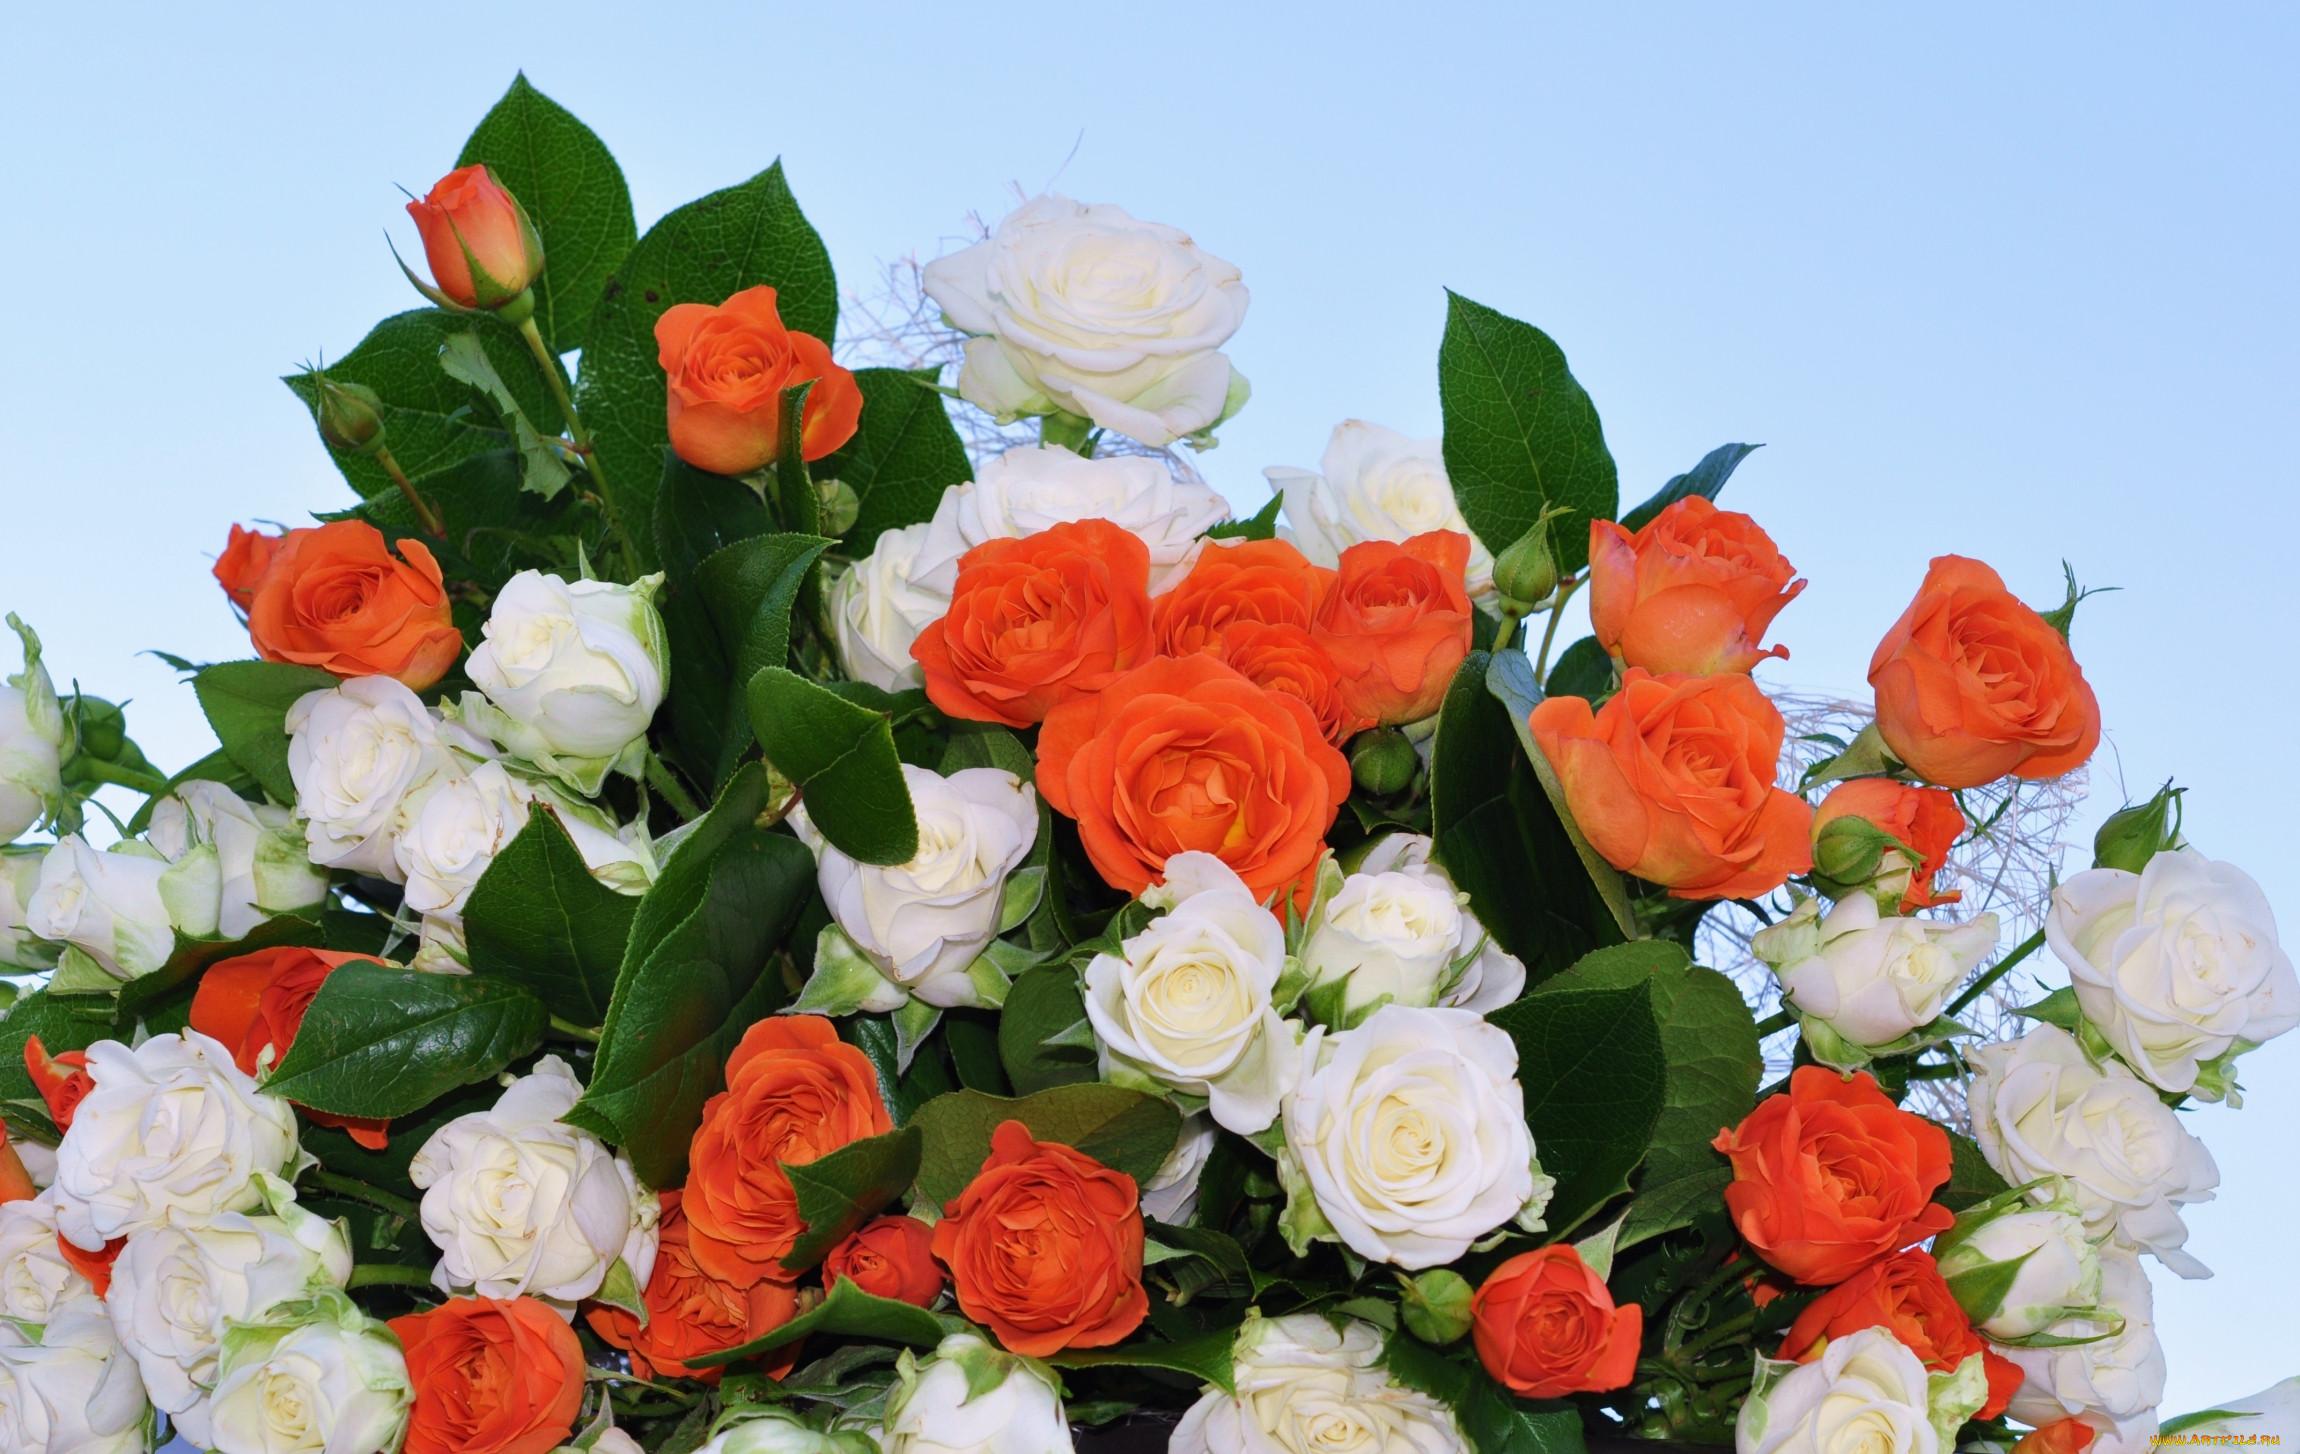 Картинки со словами для тебя с букетами цветов